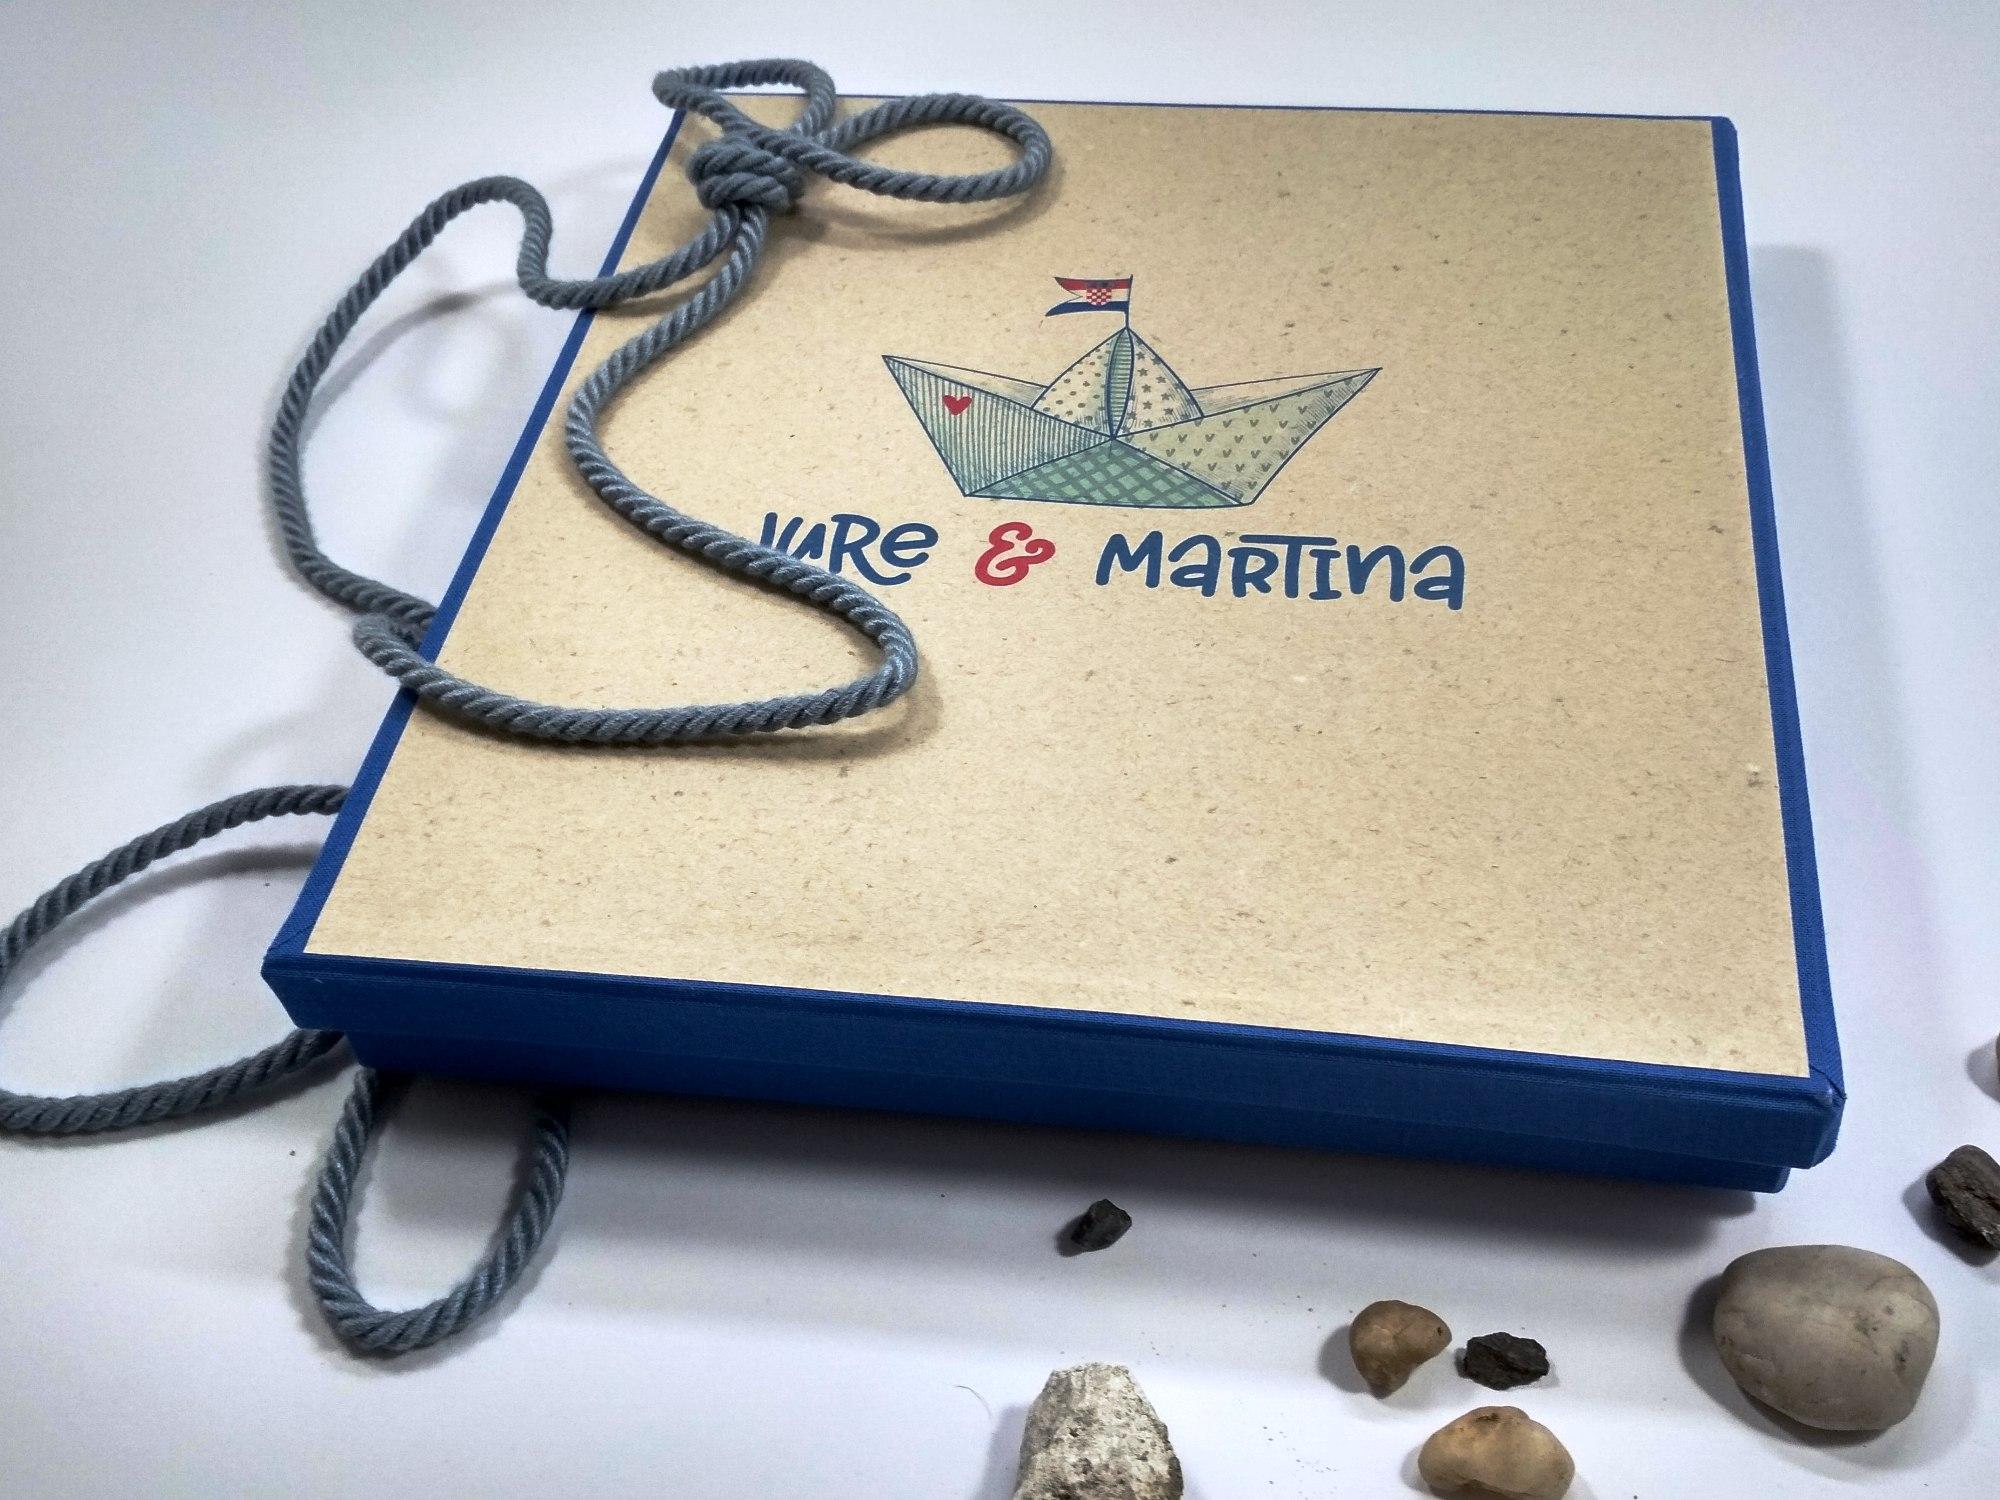 Fotoalbum - Jure & Martina